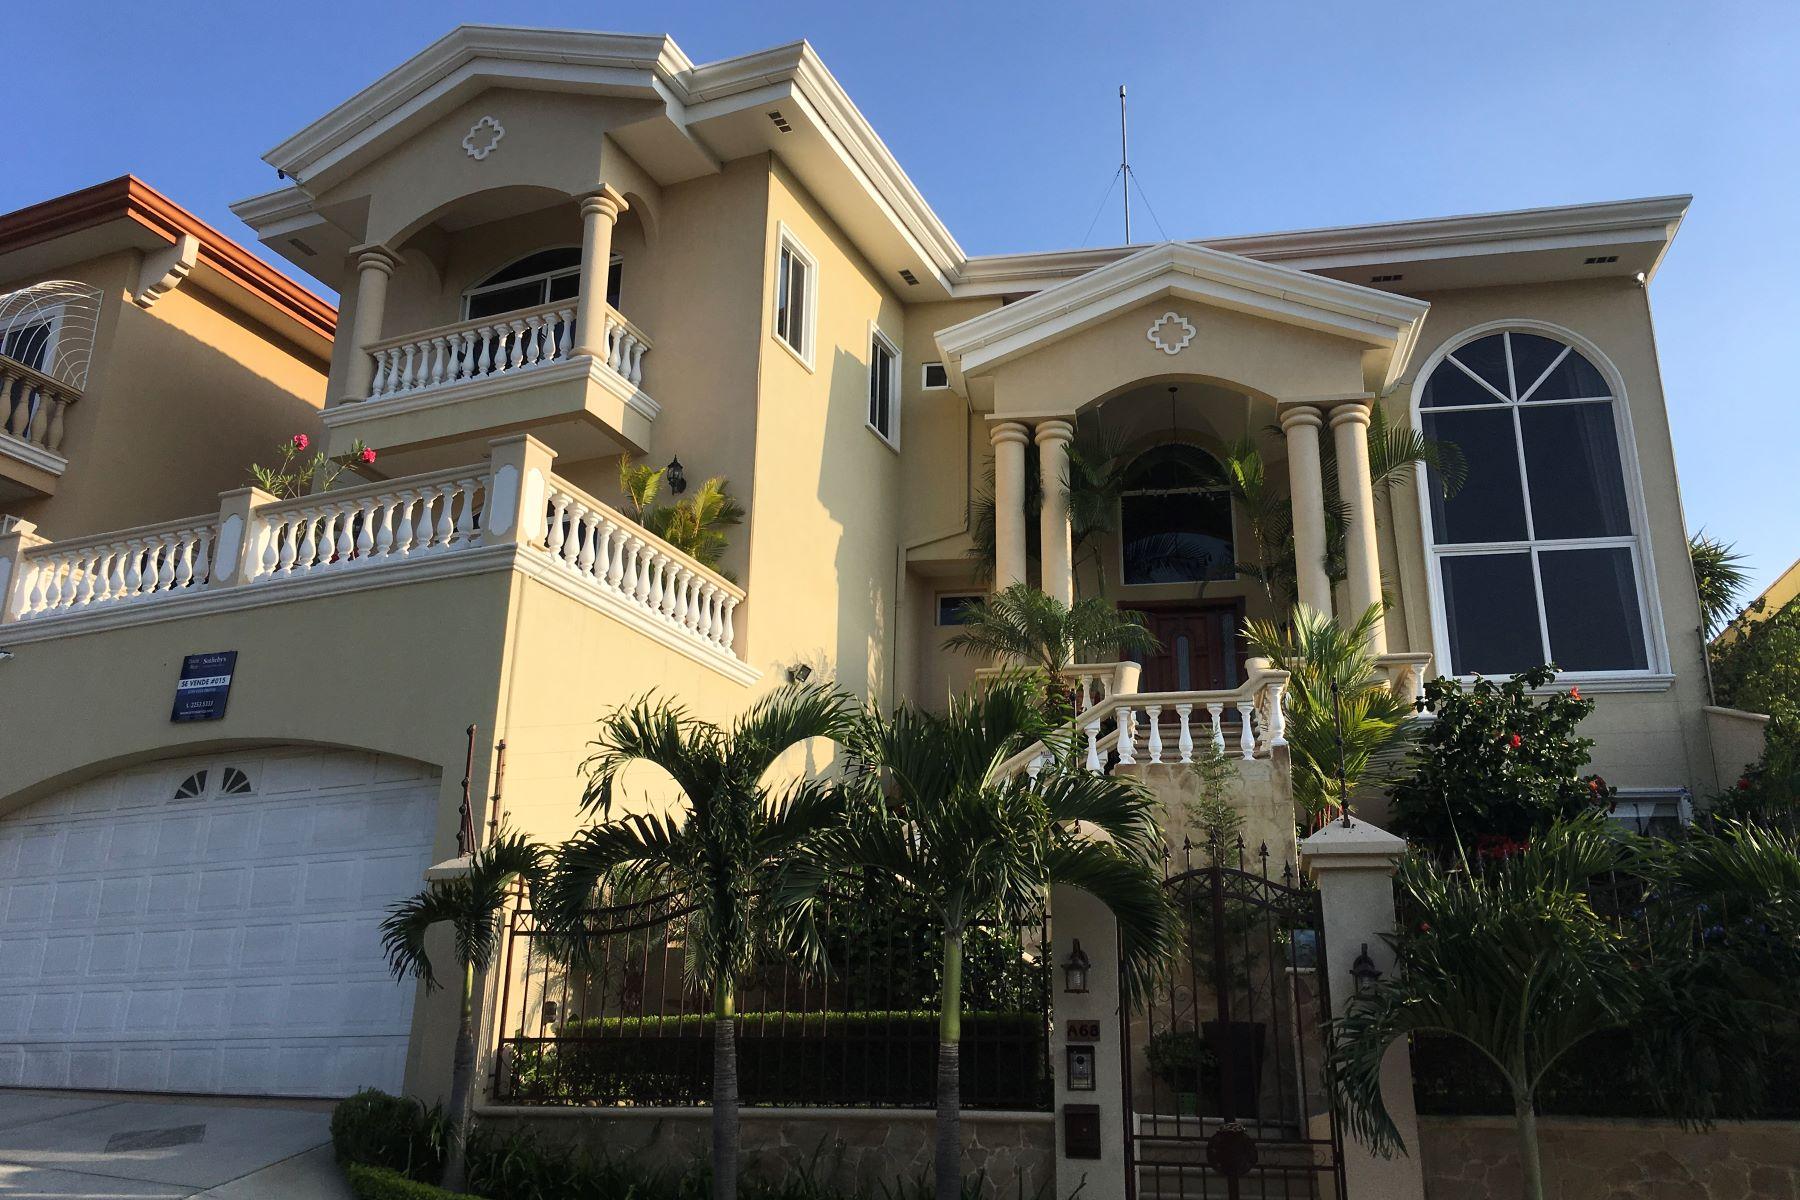 Single Family Home for Sale at Ciudad Cariari de Belén Belen, Costa Rica